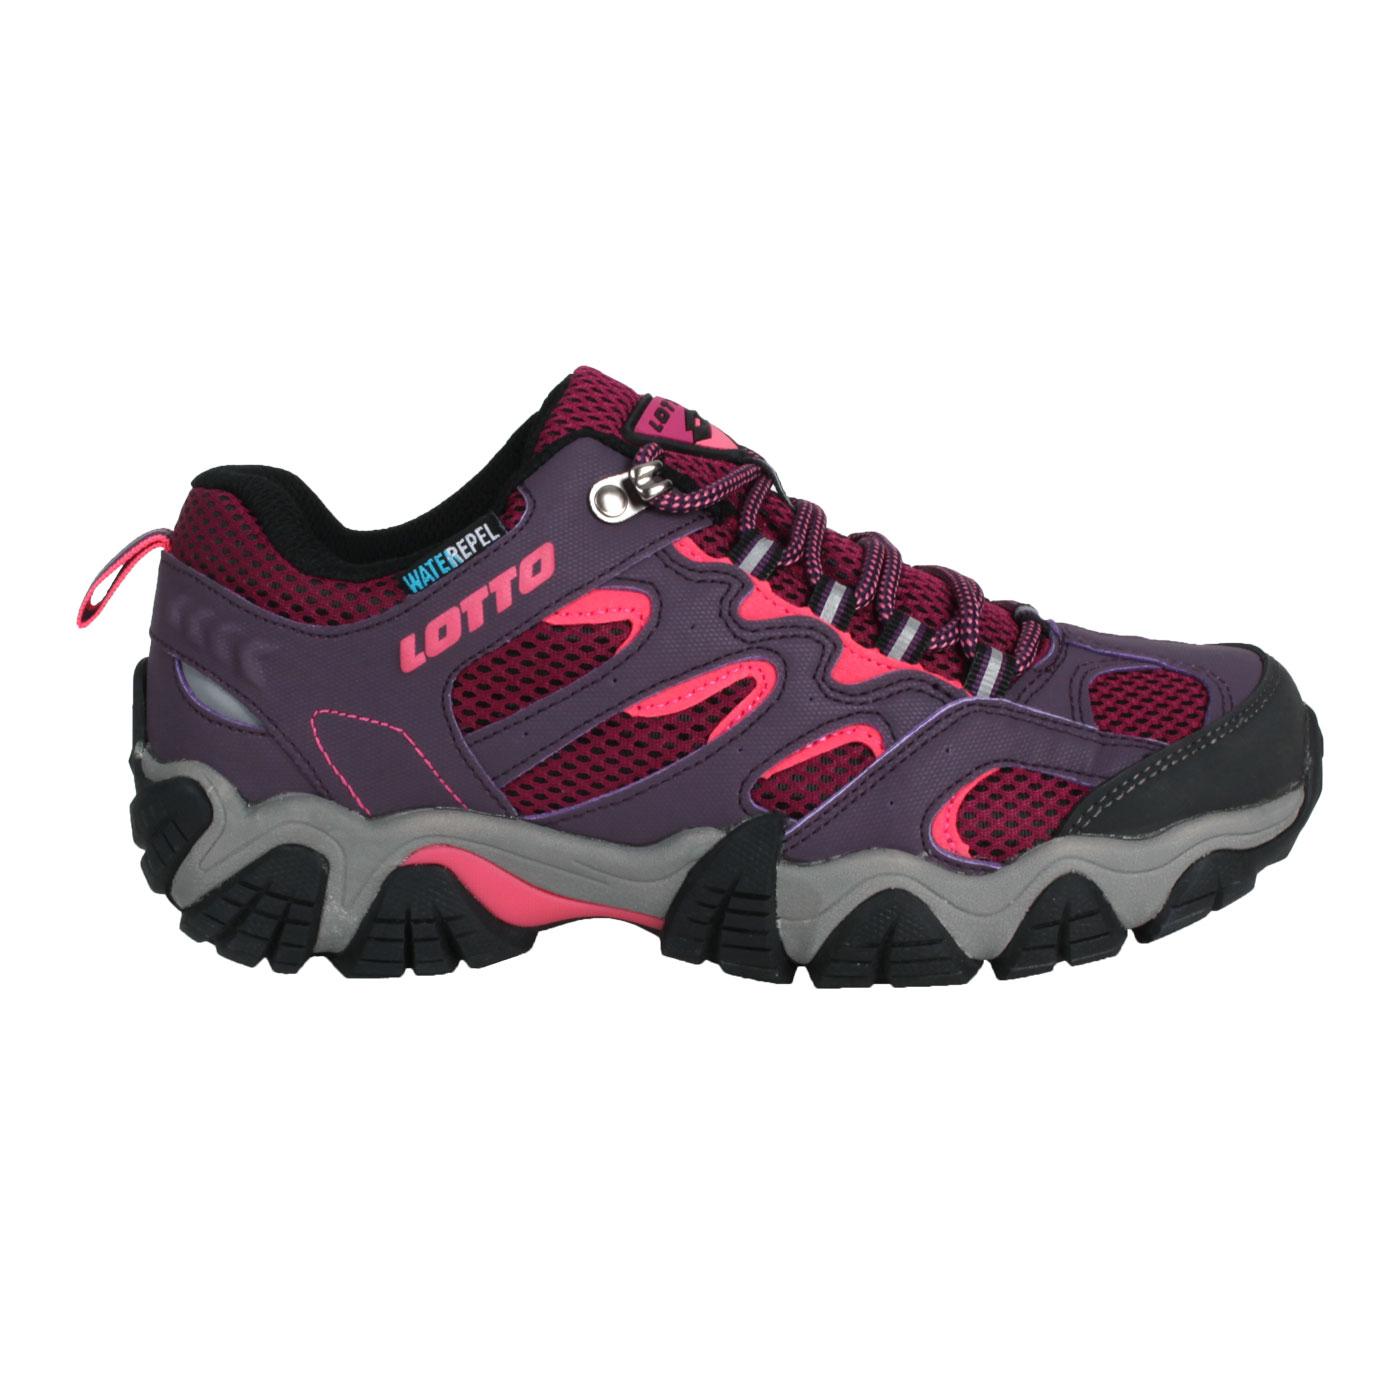 LOTTO 女款防水登山踏青鞋 LT1AWO3807 - 紫紅